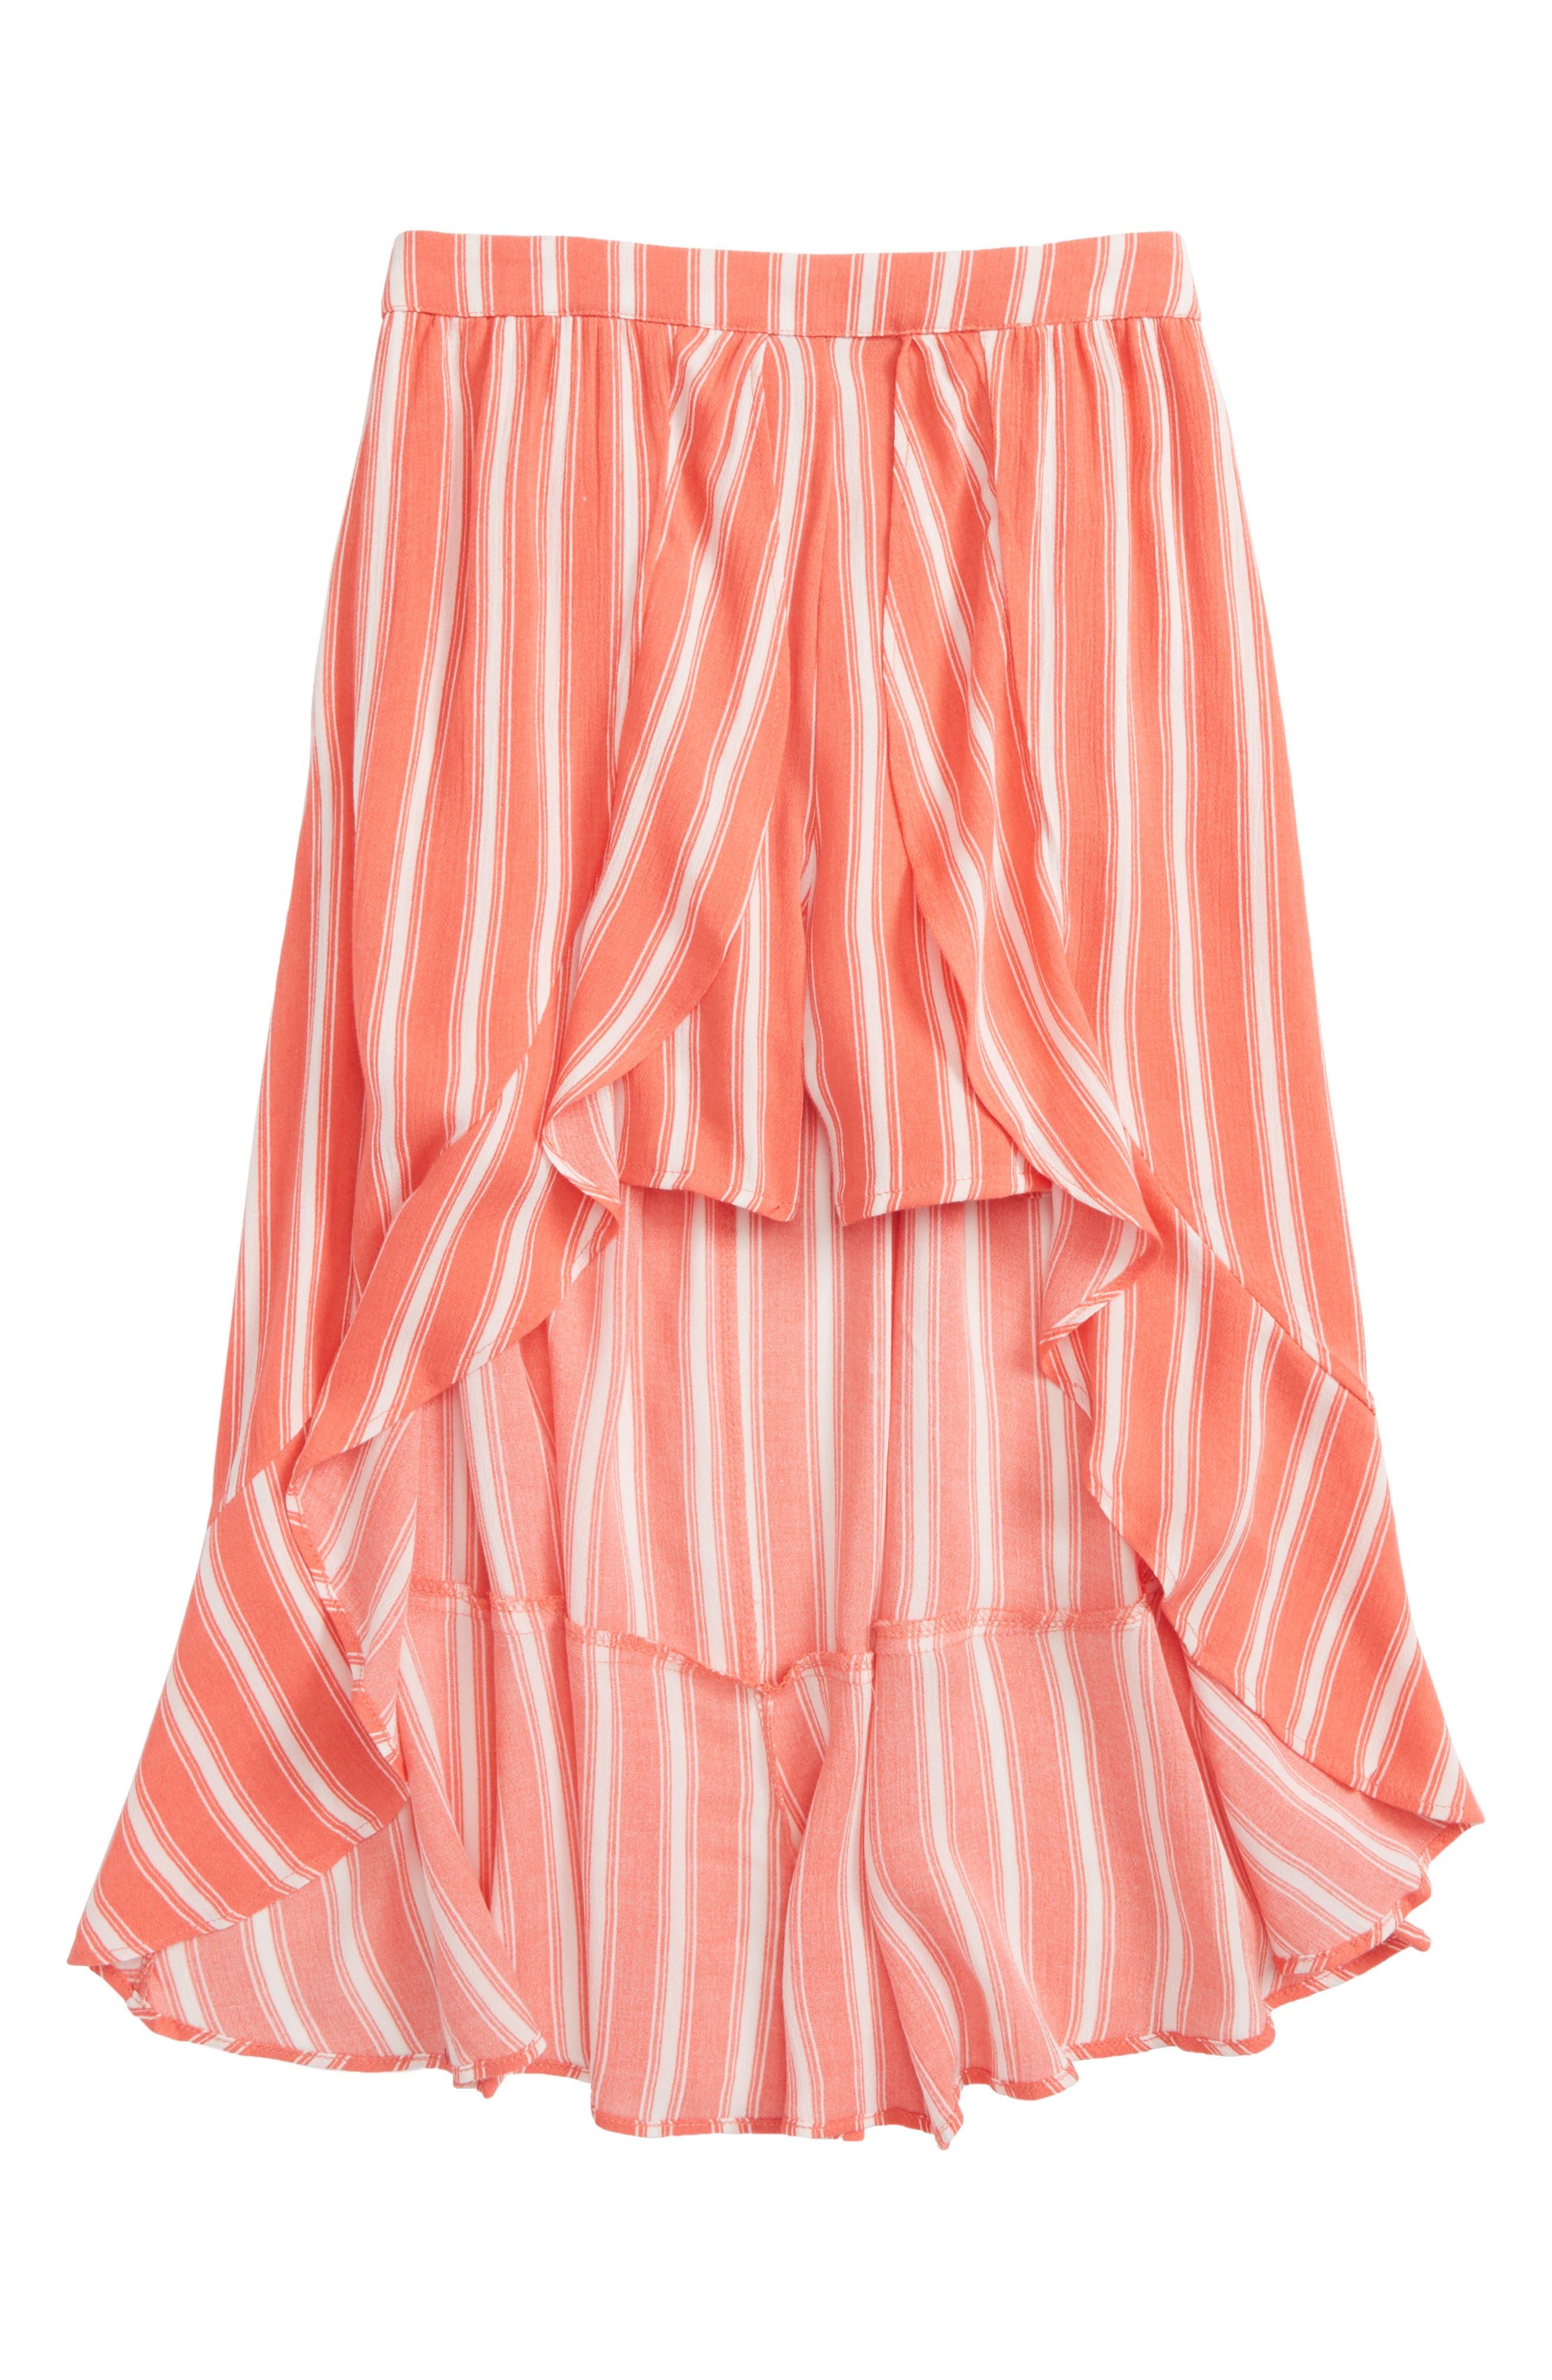 Stripe Walk Through Skirt,                         Main,                         color, 950